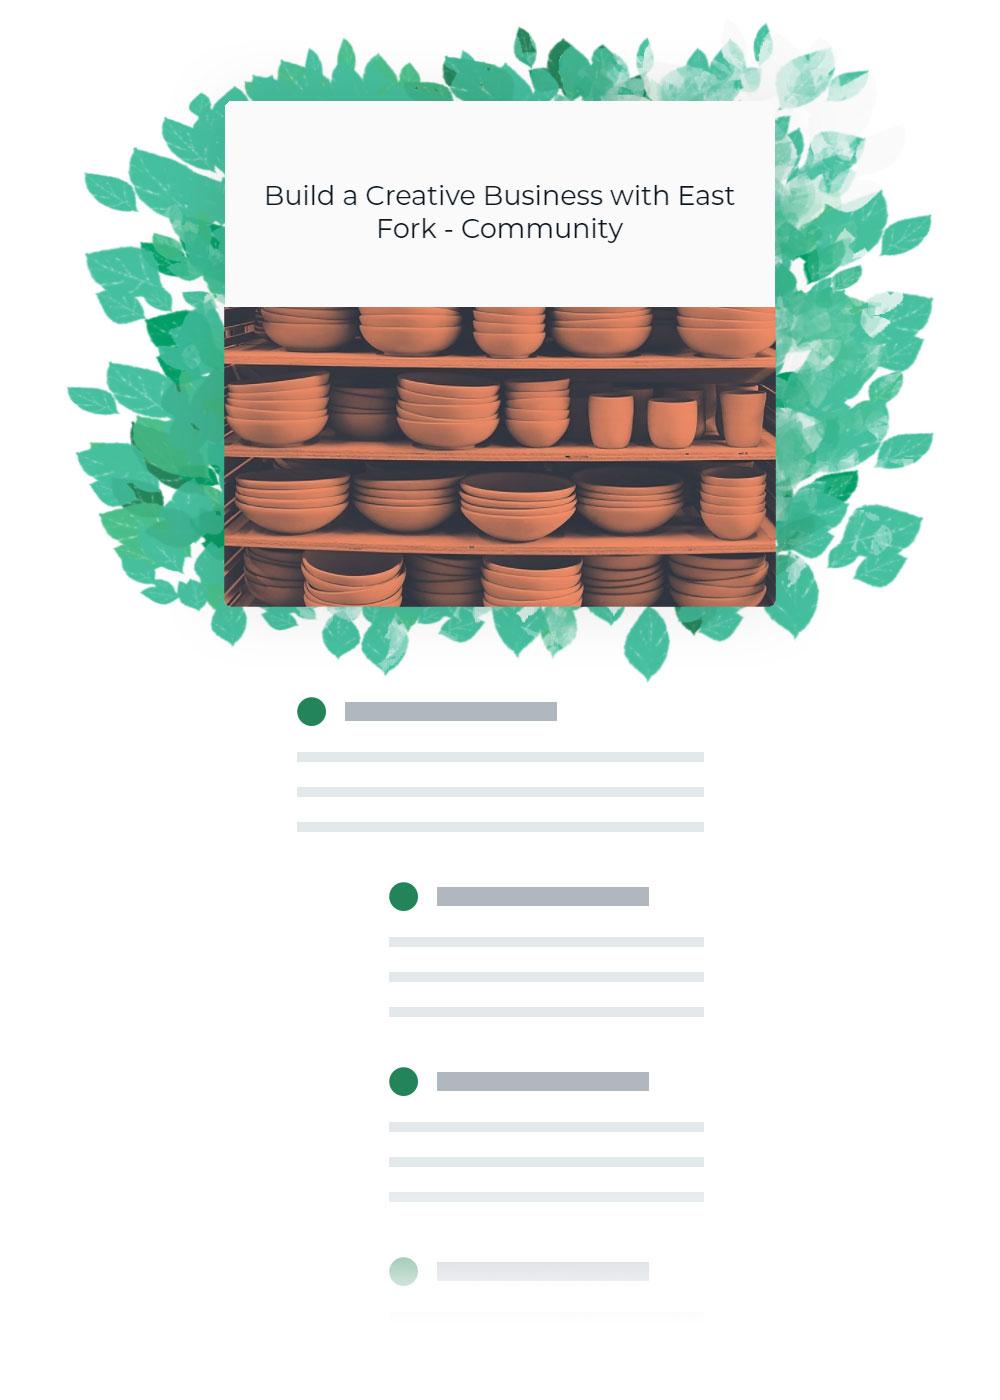 East Fork DesignClass community